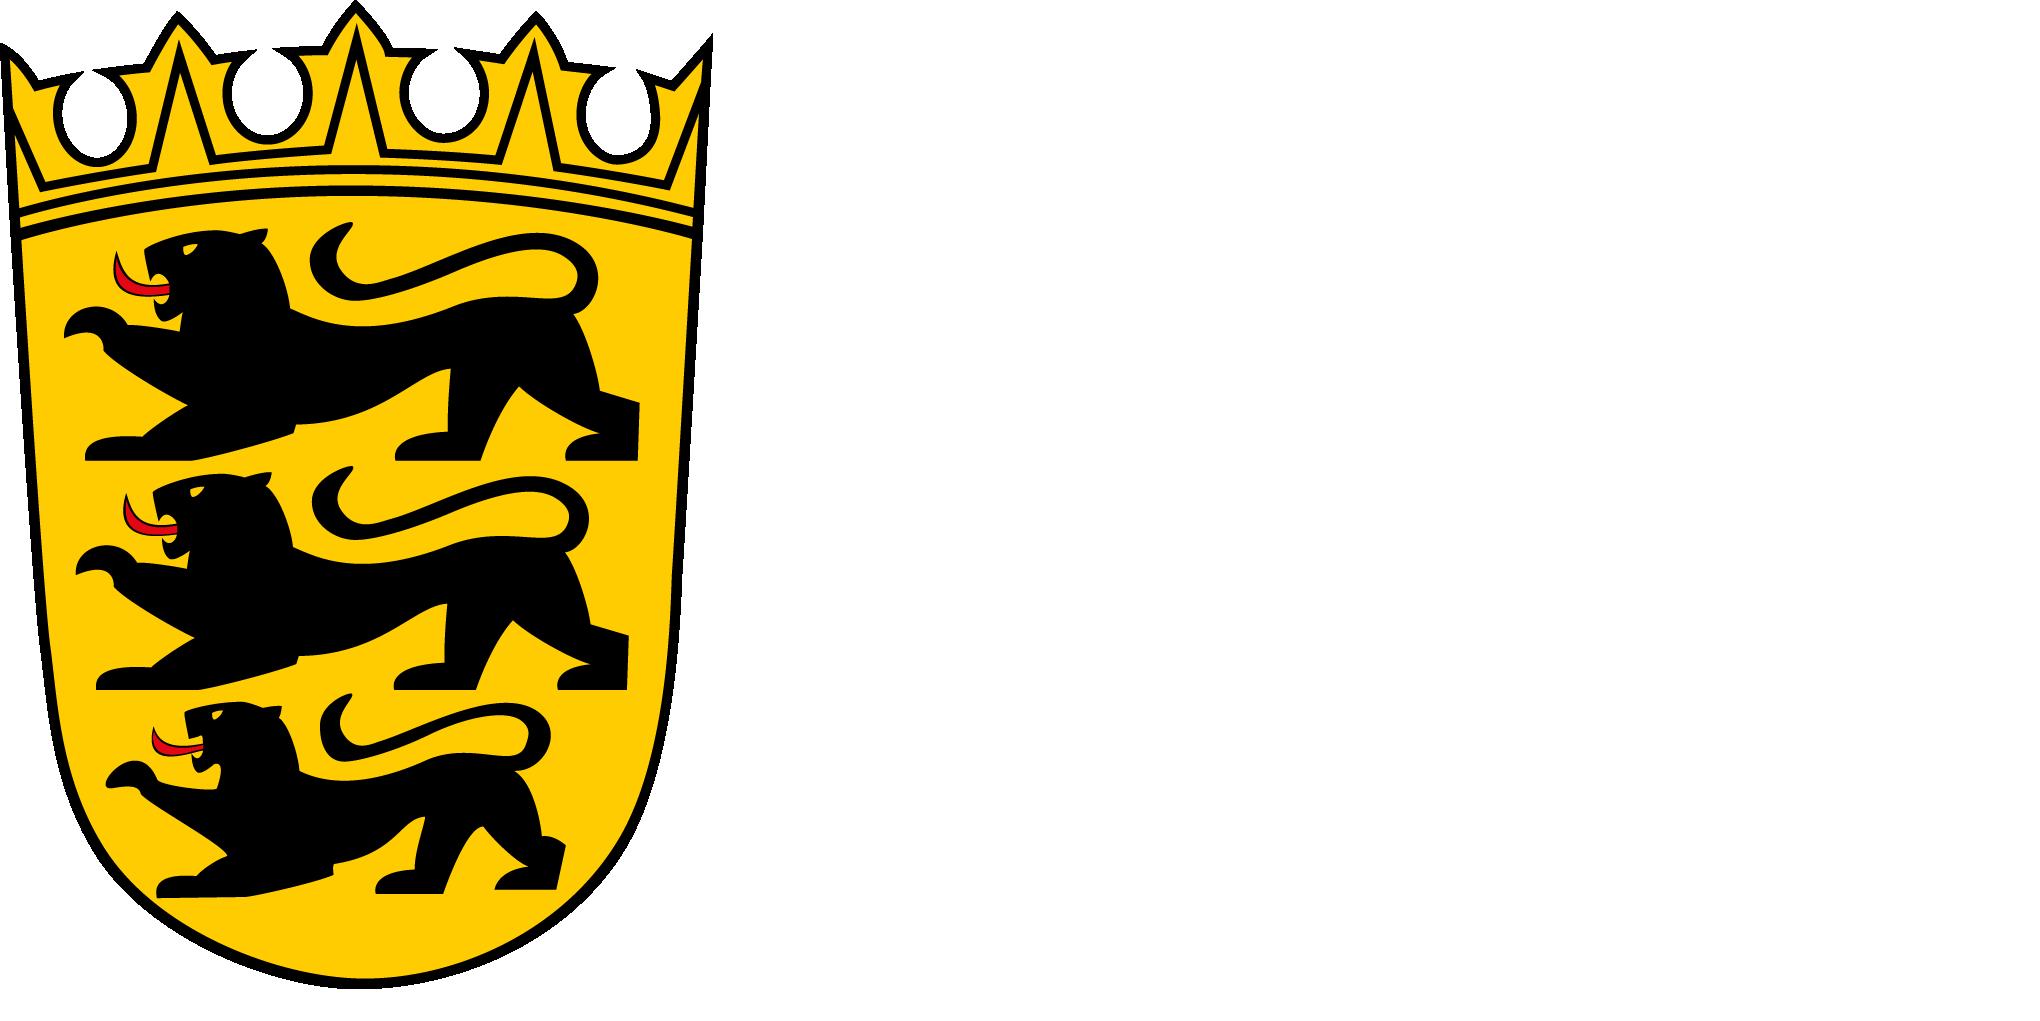 Notare-Kurz.de